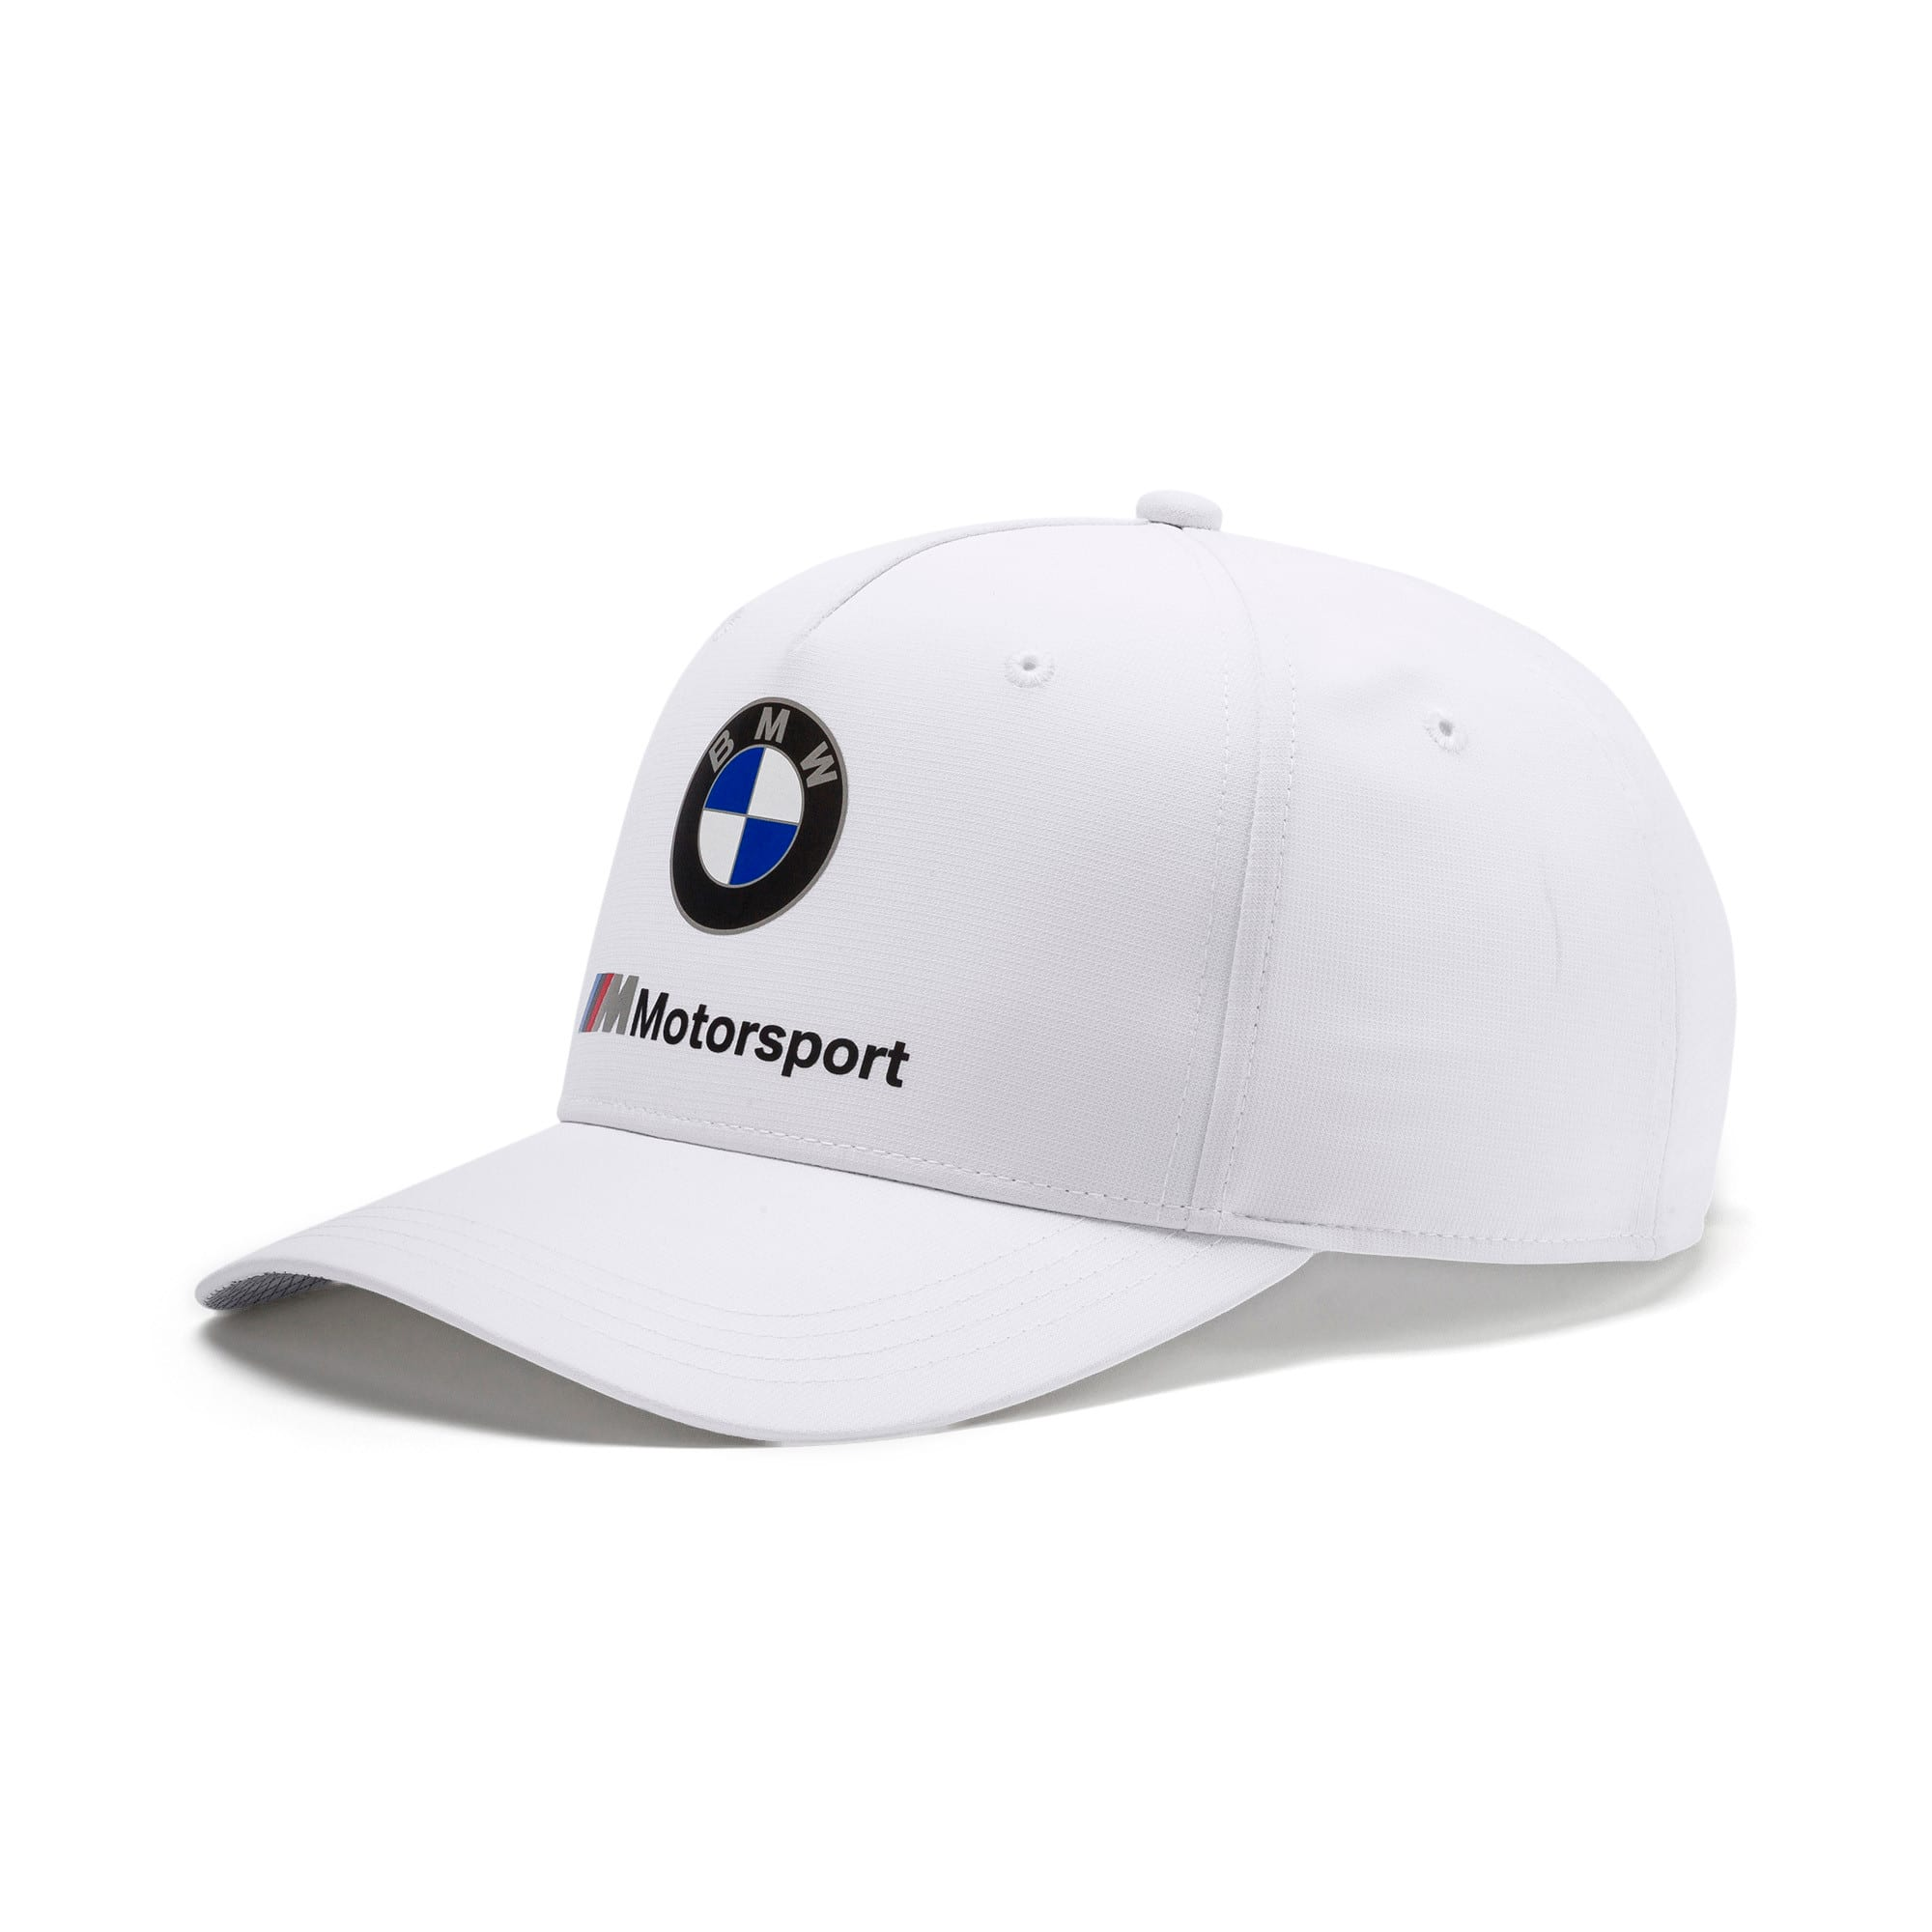 Thumbnail 1 of BMW M Motorsport Cap, Puma White, medium